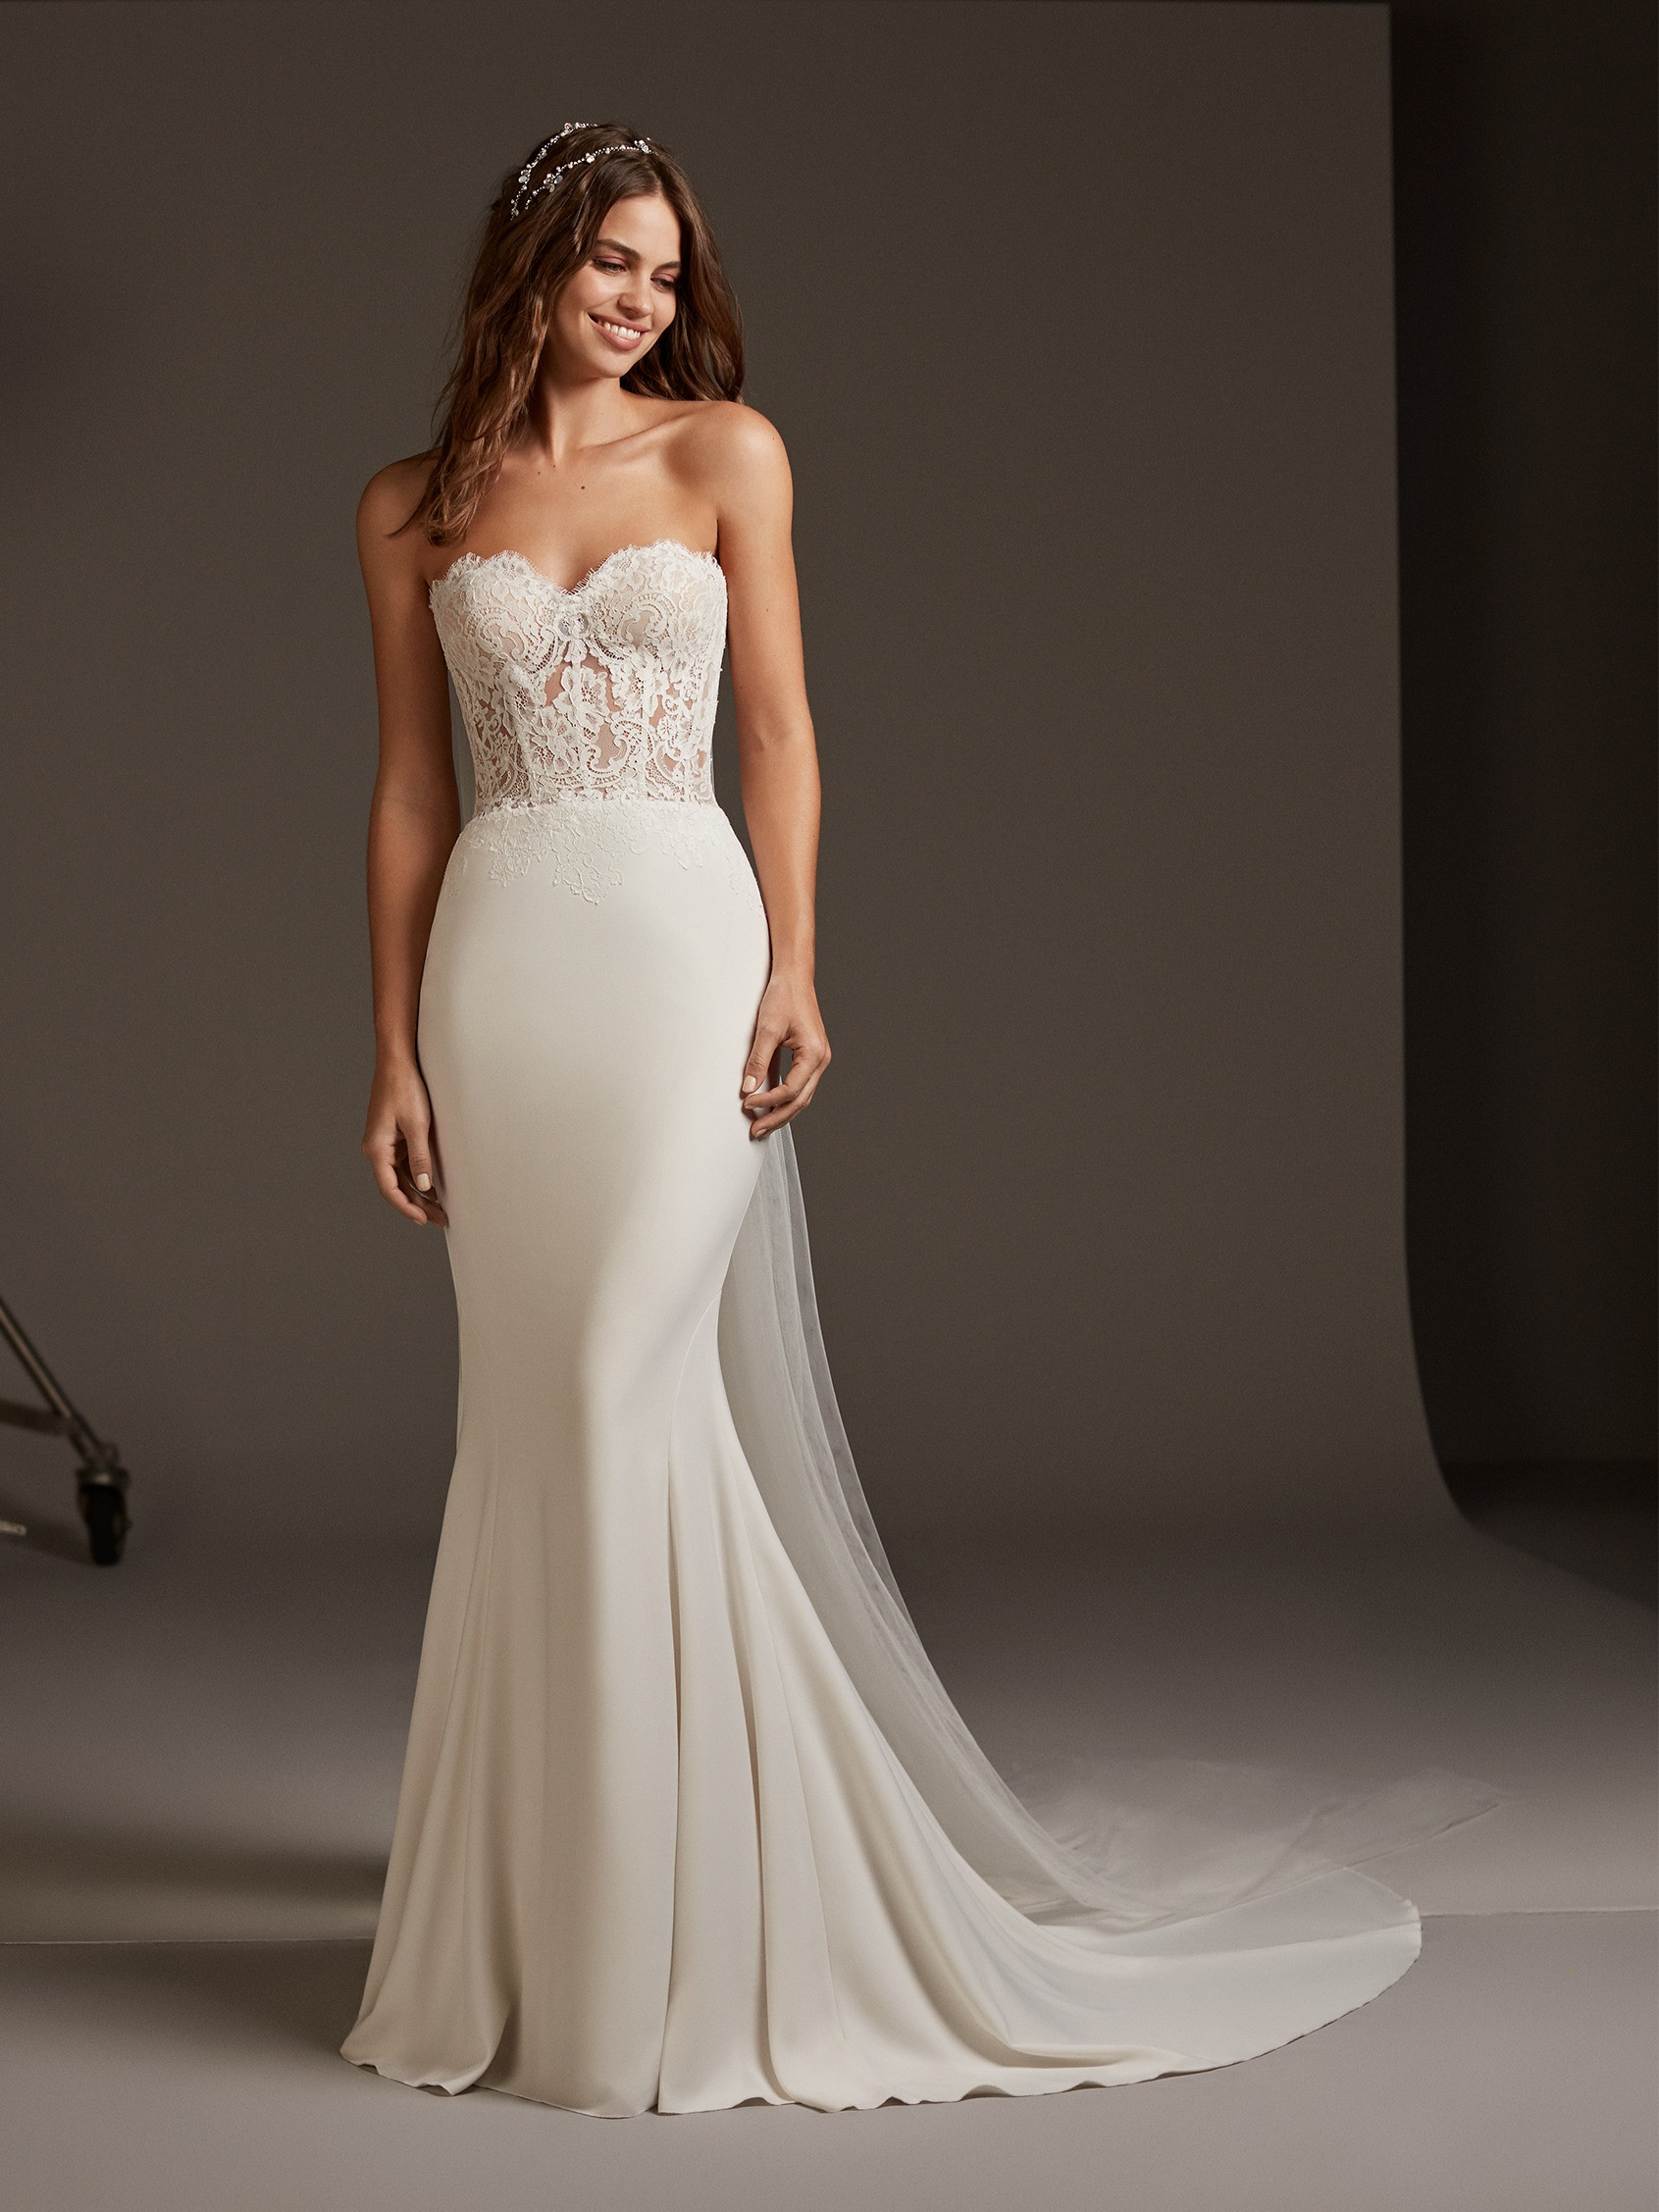 Mira Couture Pronovias Vela Wedding Dress Bridal Gown Barcelona Designer Chicago Boutique